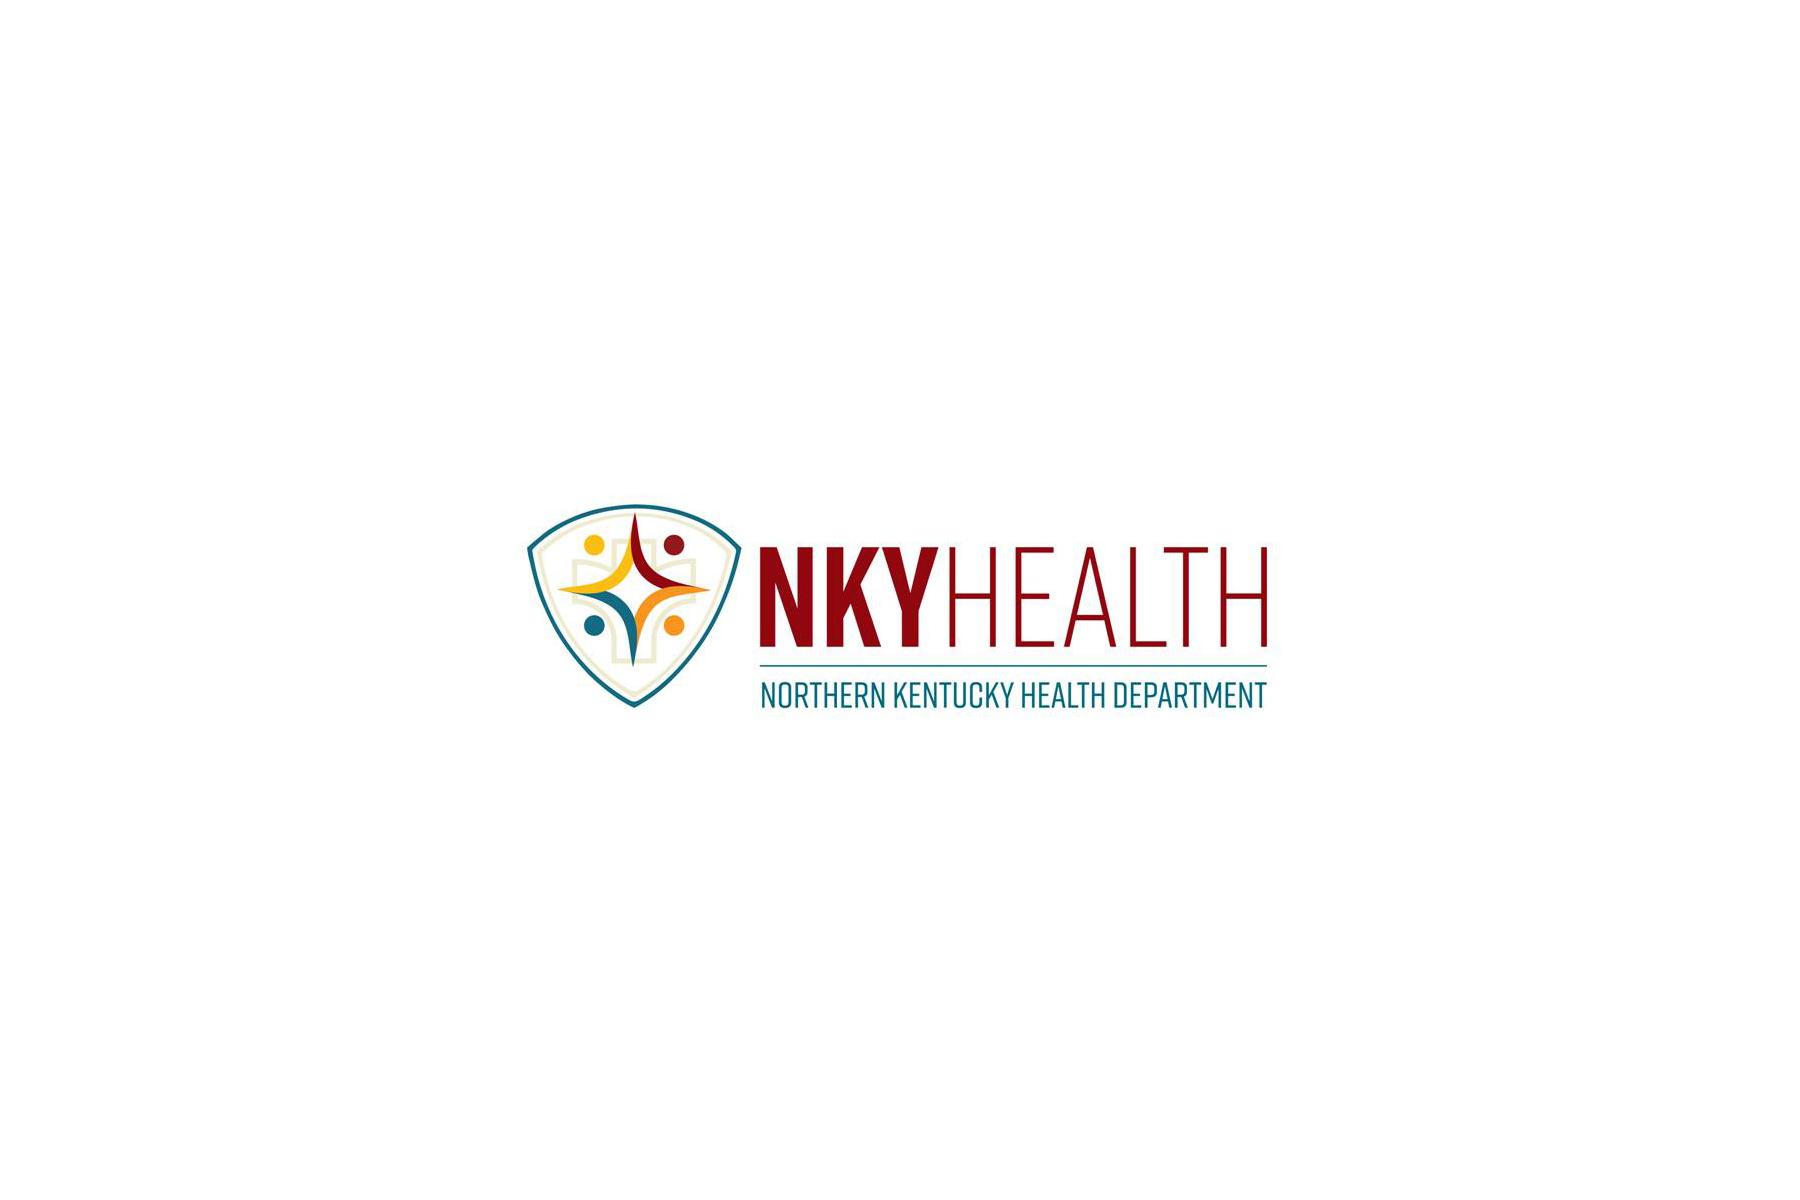 NKY Health